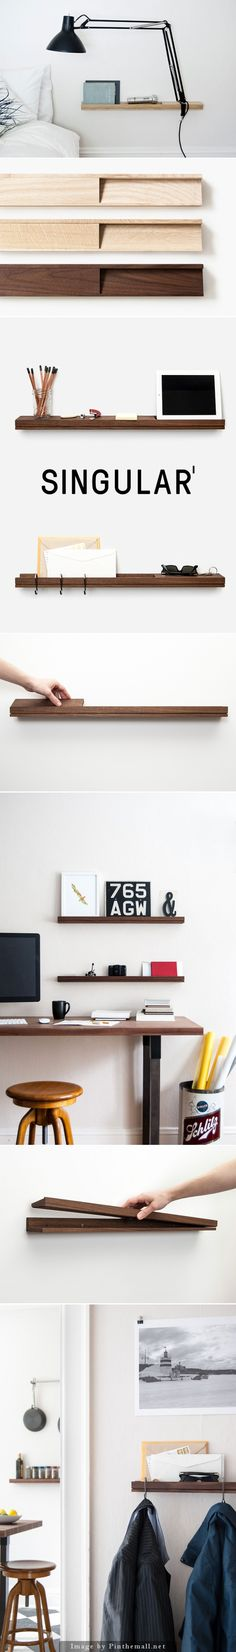 Fresh Handmade for the Home: Introducing Singular shelving